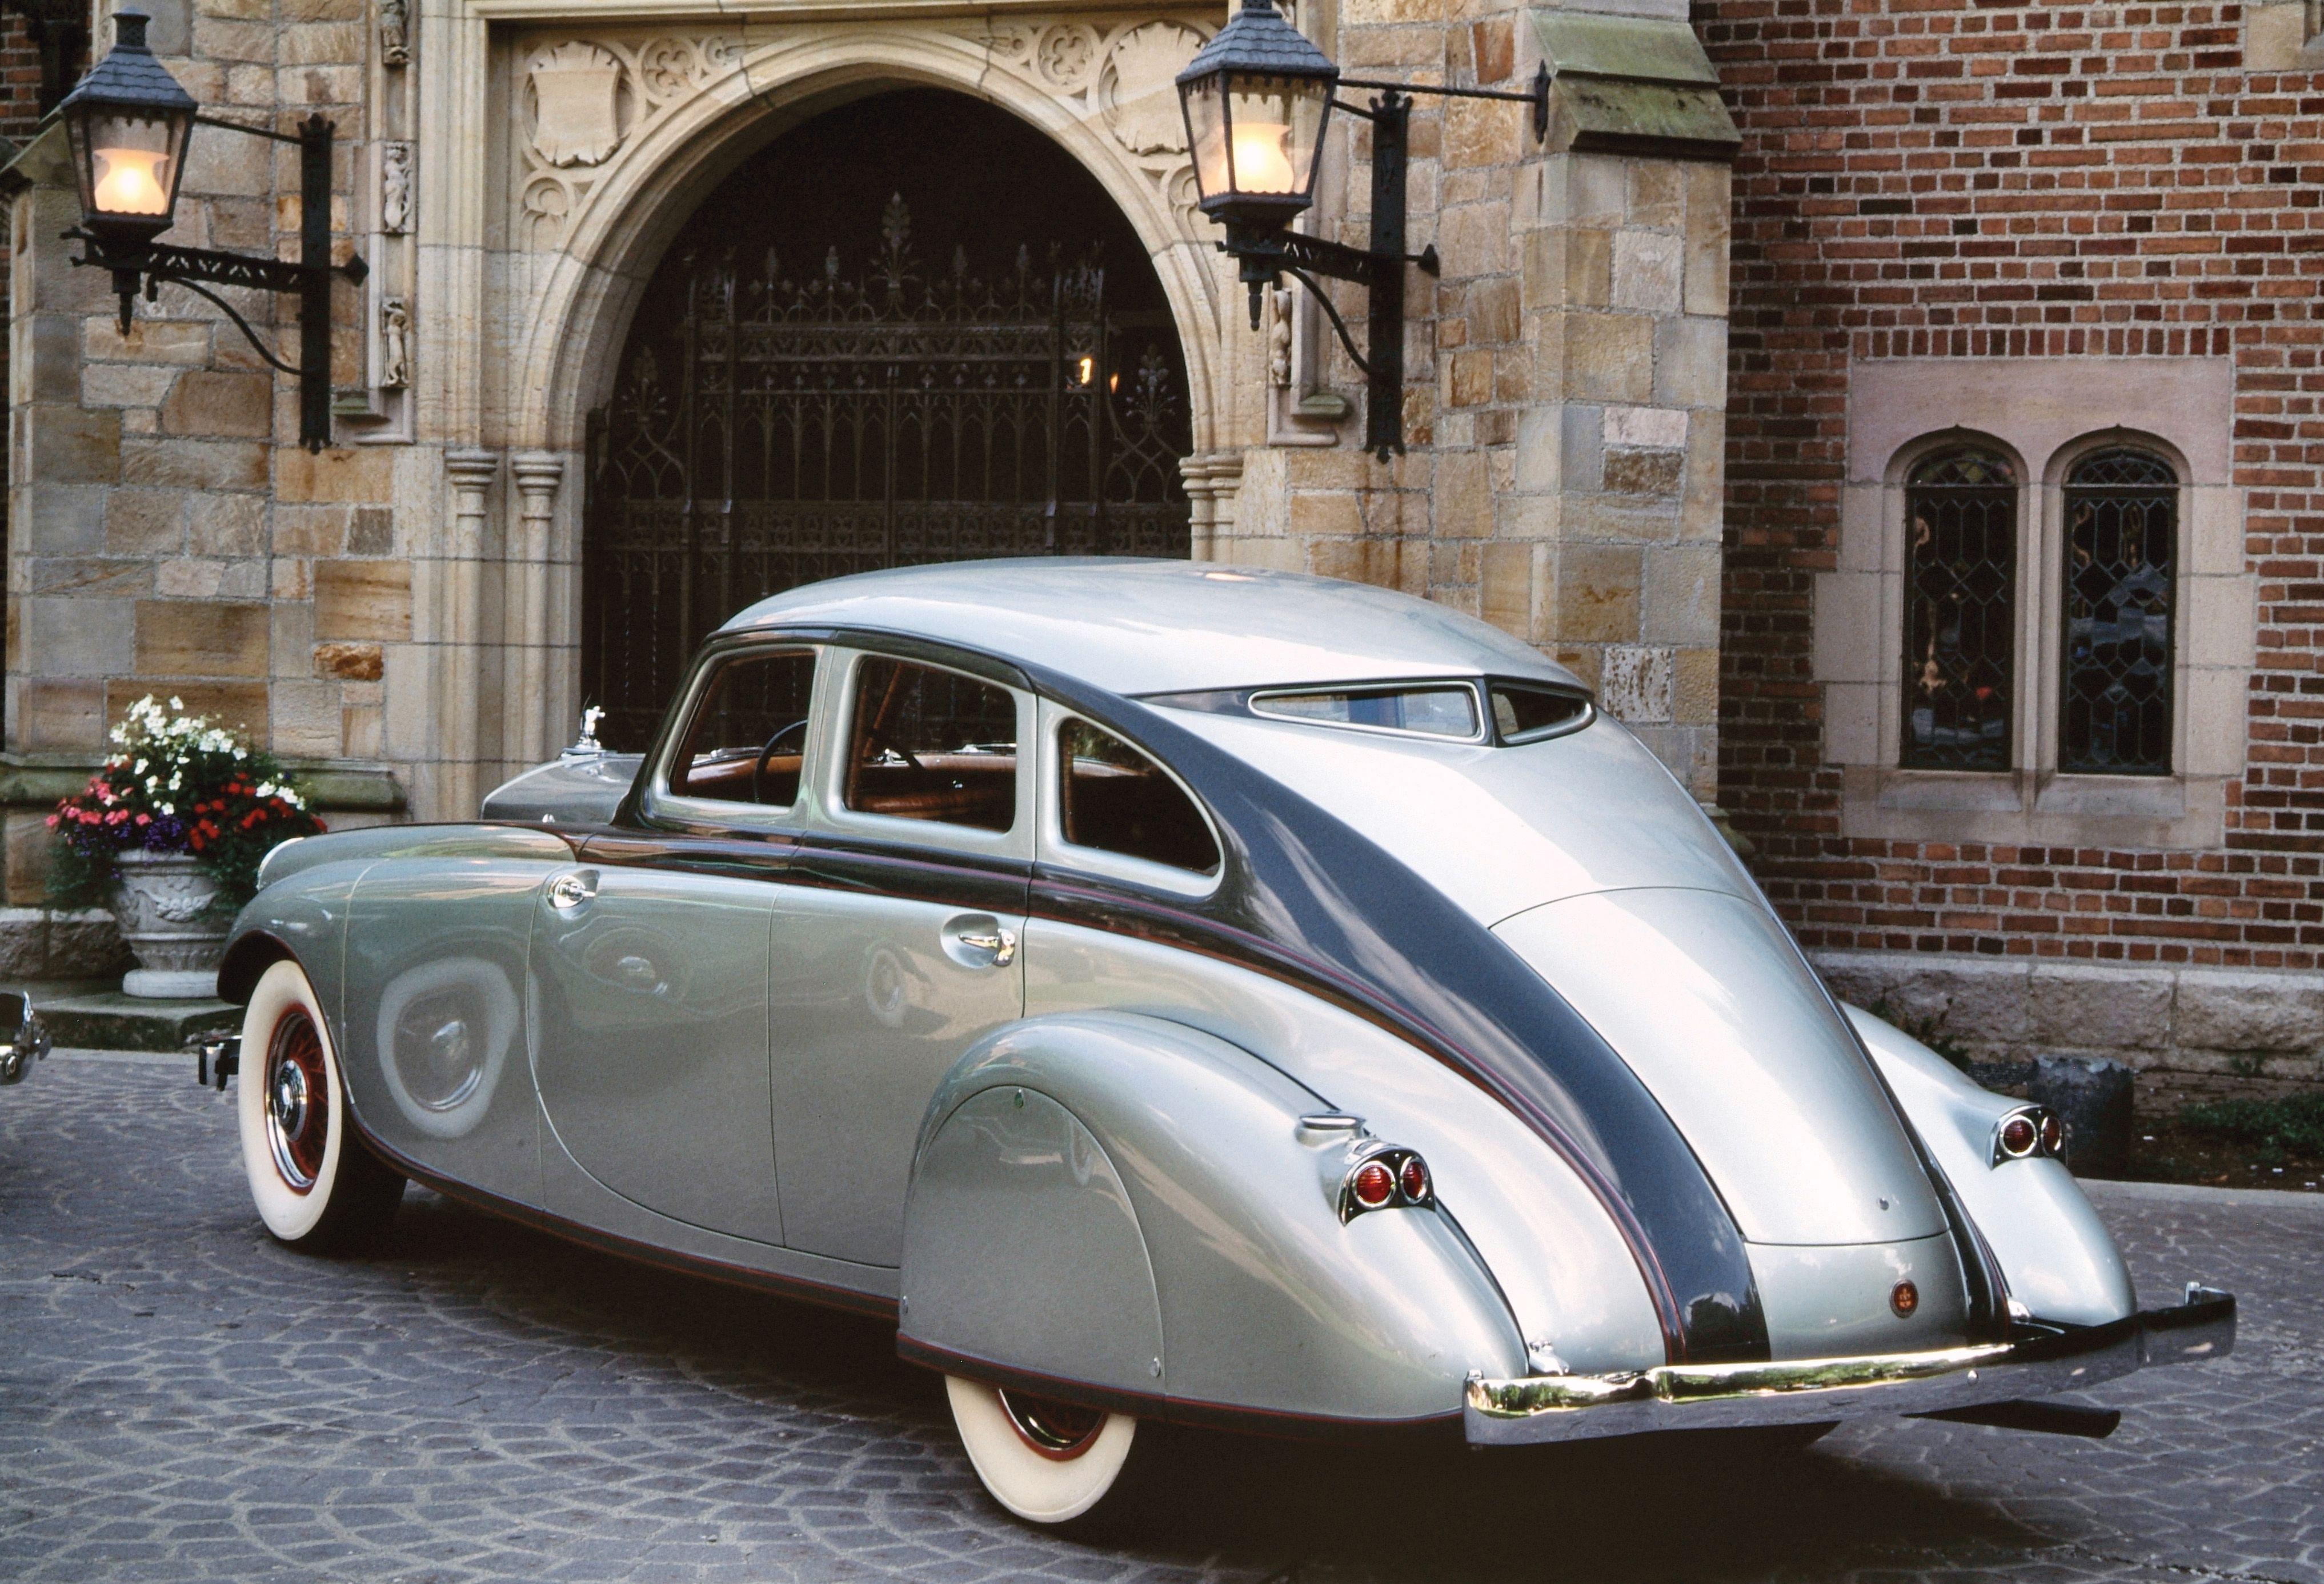 1933 Pierce-Arrow Silver Arrow Rear | Classic Cars | Pinterest ...